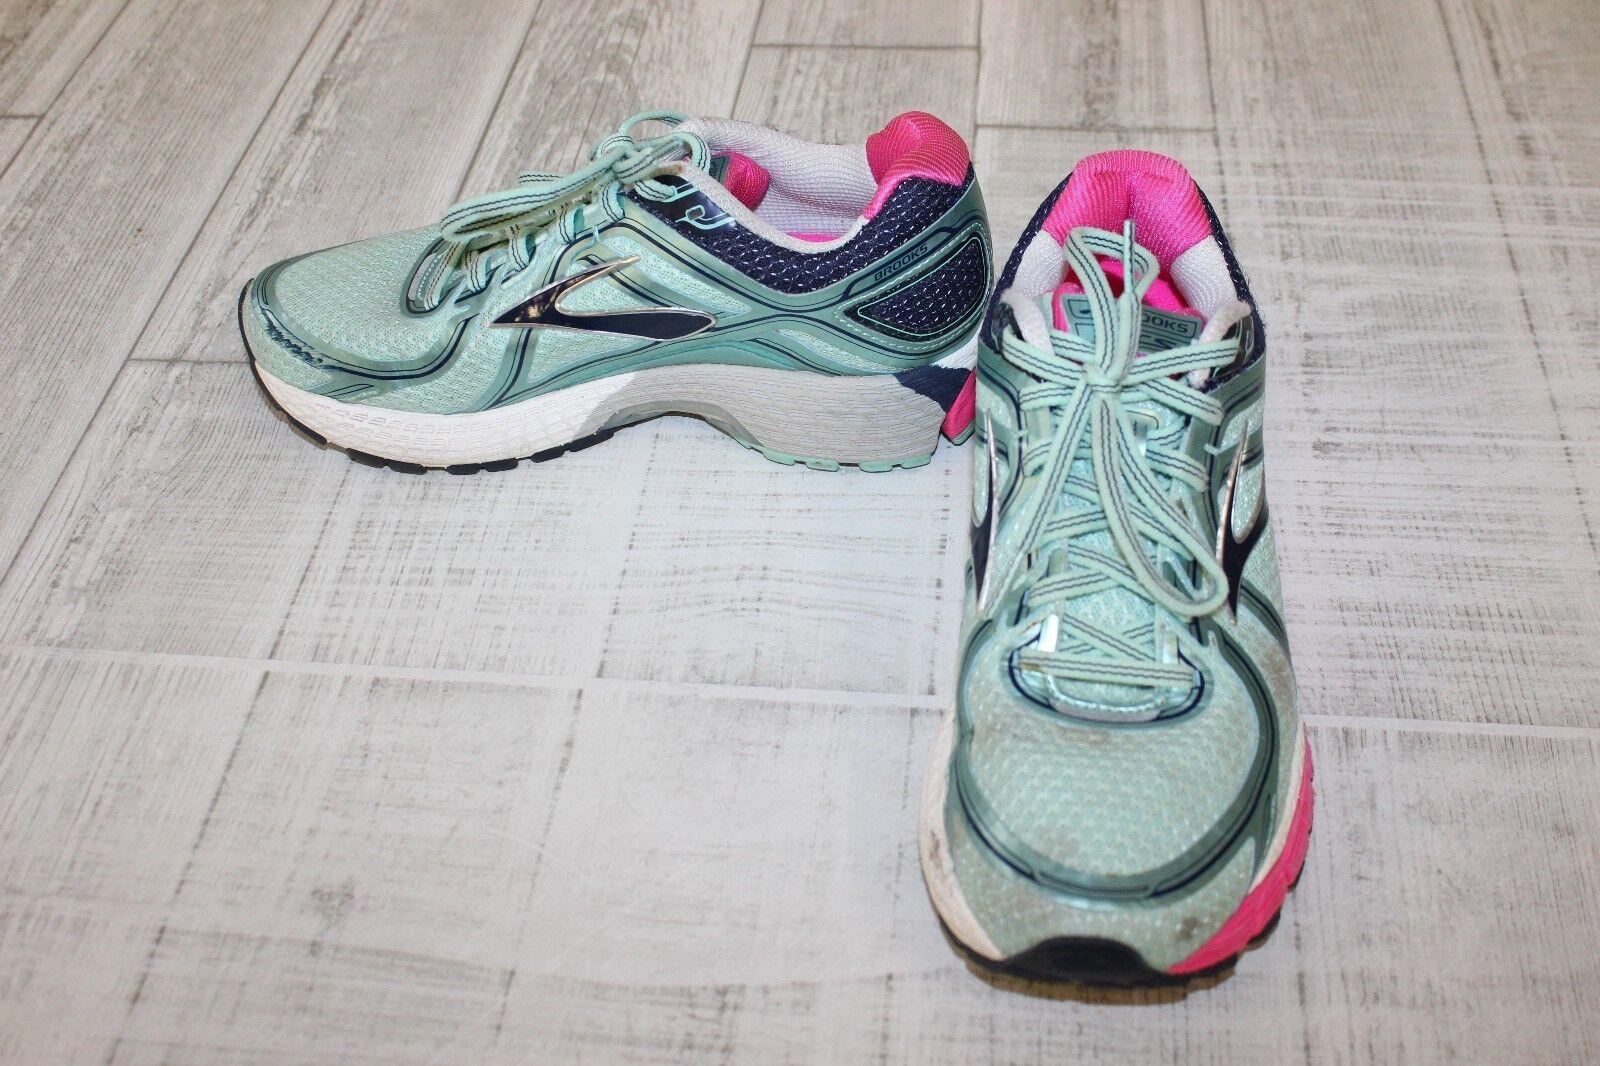 Brooks Adrenaline GTS 16 Running Shoes - Women's Size 7.5 B, Navy/Pink/Mint